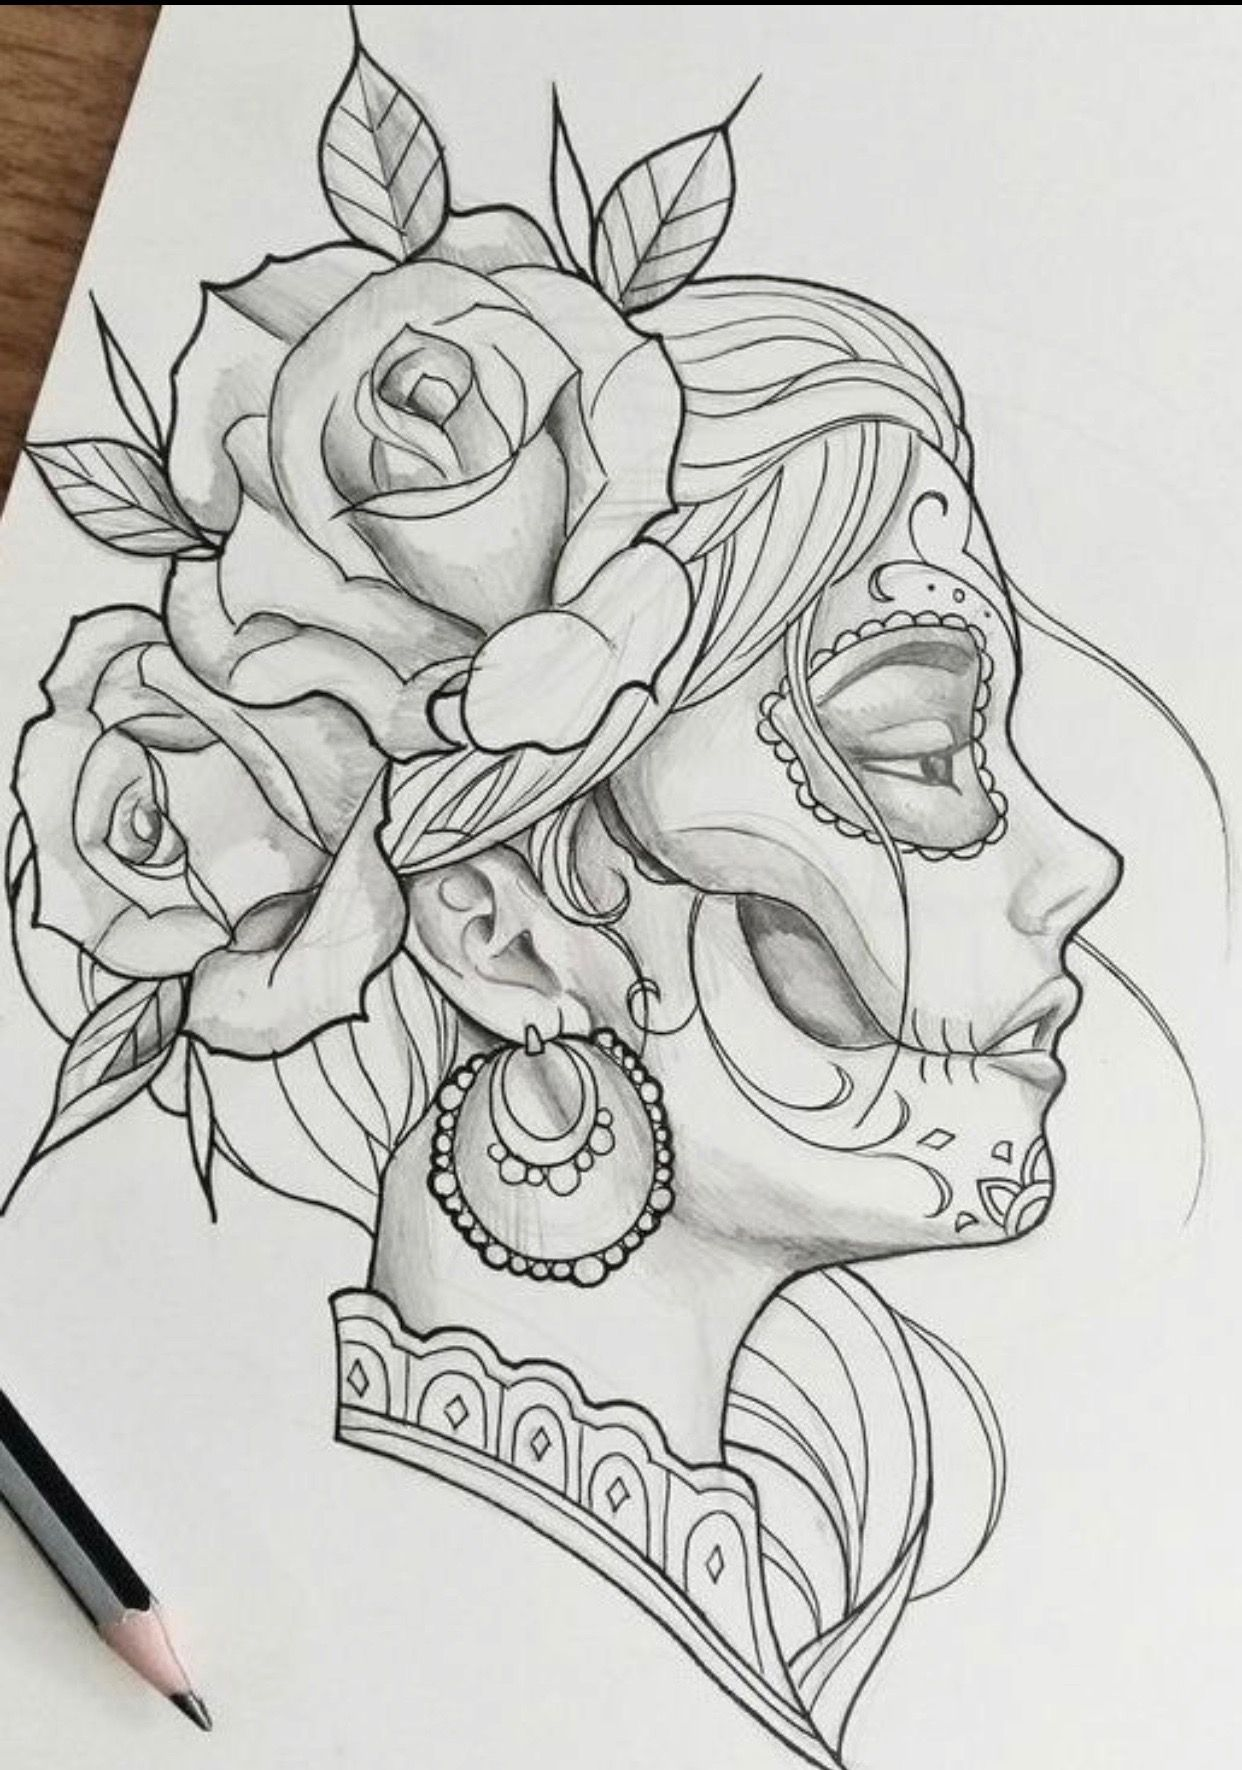 Pin De Daniel Santos En Pencil Drawing Dibujos A Lapiz Increibles Catrinas Dibujo Dibujos Para Tatuar